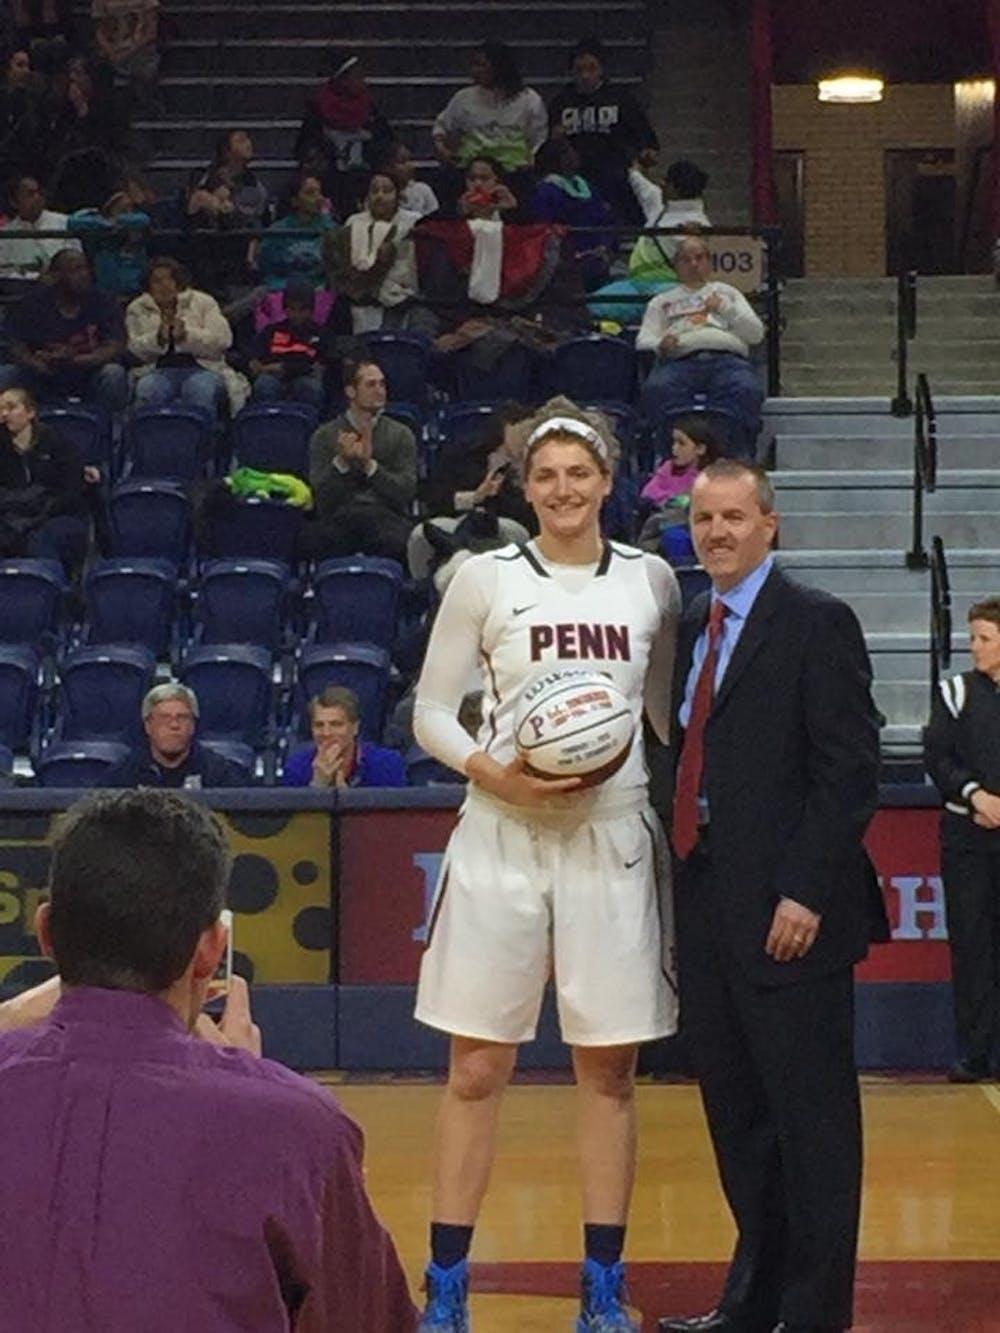 Senior forward Kara Bonenberger was honored before the game for her 1000-point career.